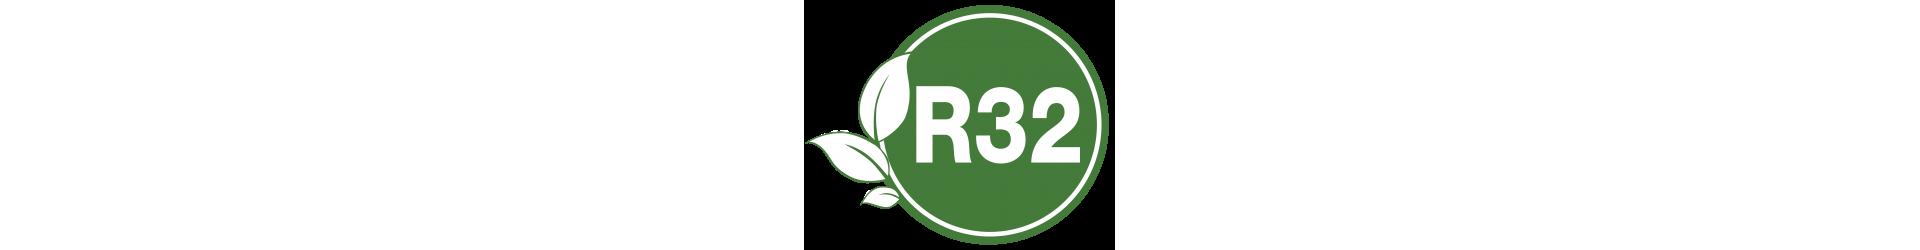 Klimageräte Fujitsu R32